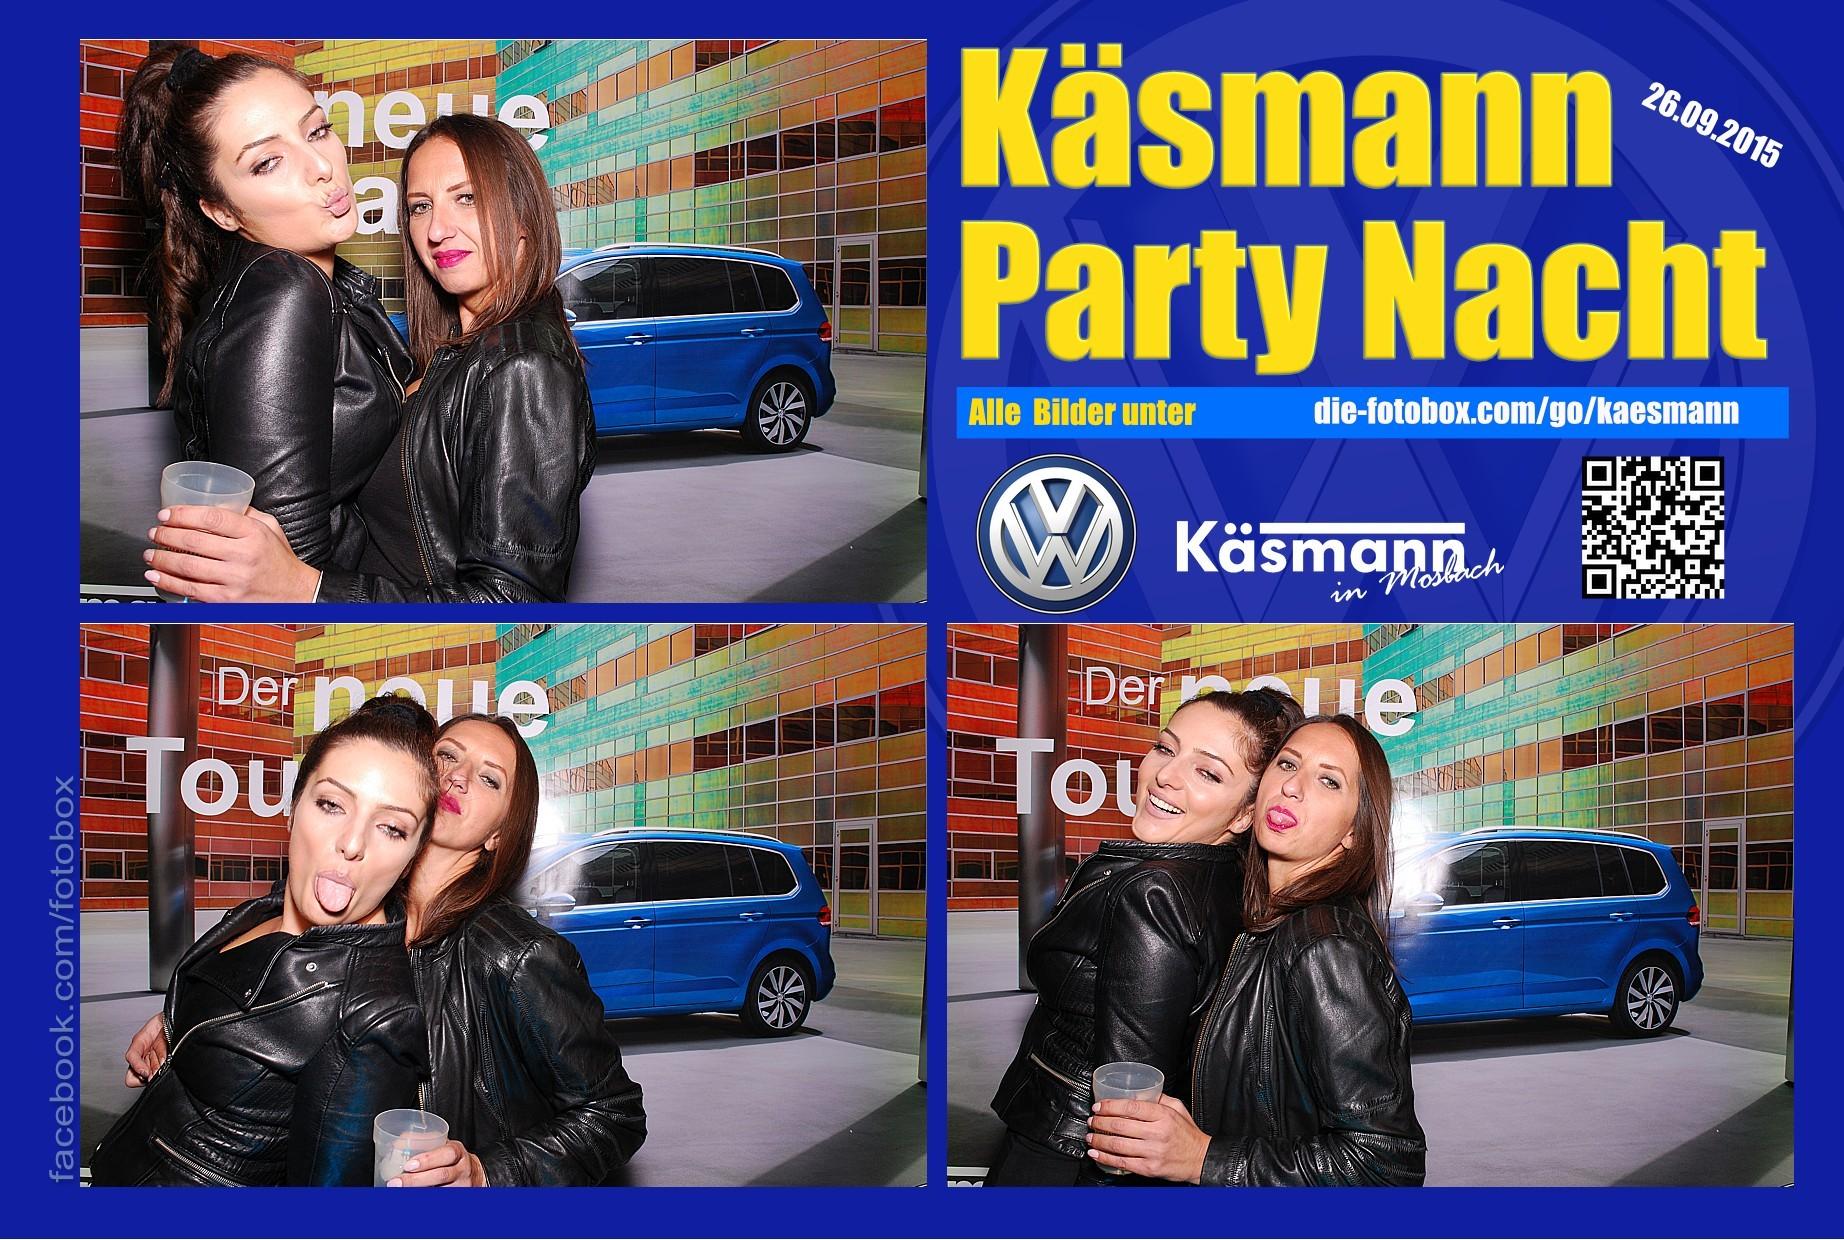 Käsmannparty 2015 - www.die-fotobox.com 01080